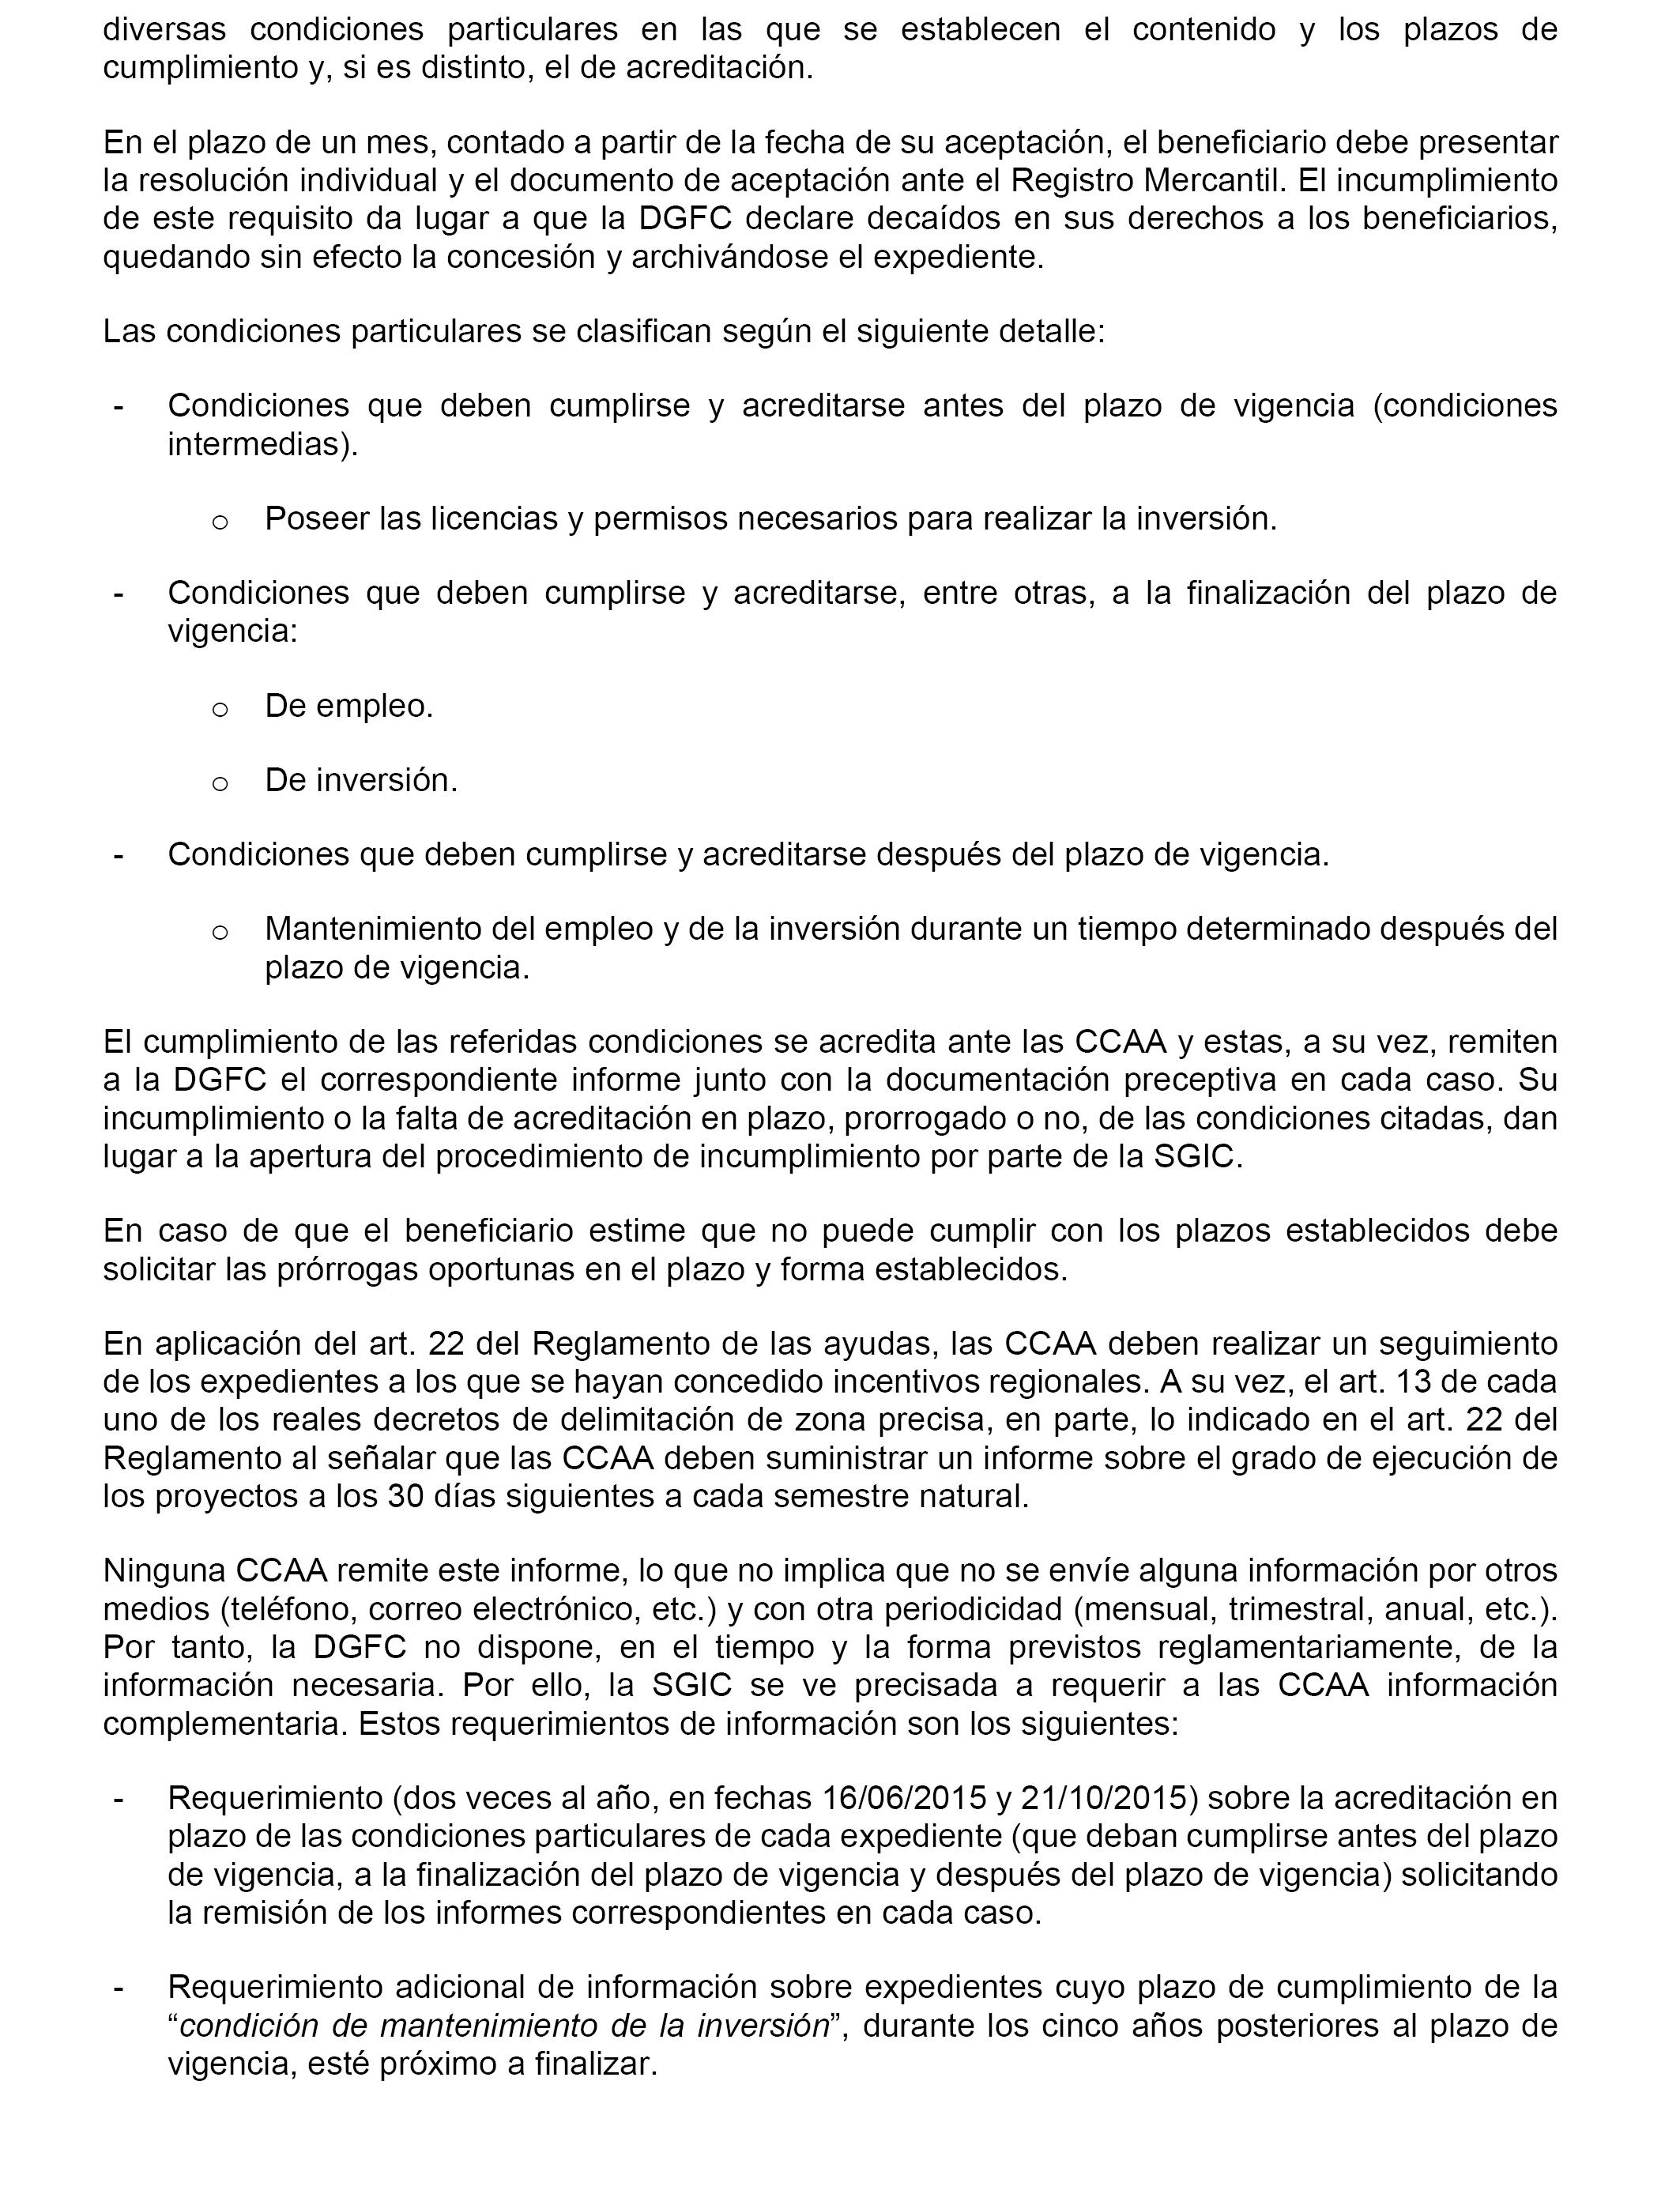 BOE.es - Documento BOE-A-2018-2793